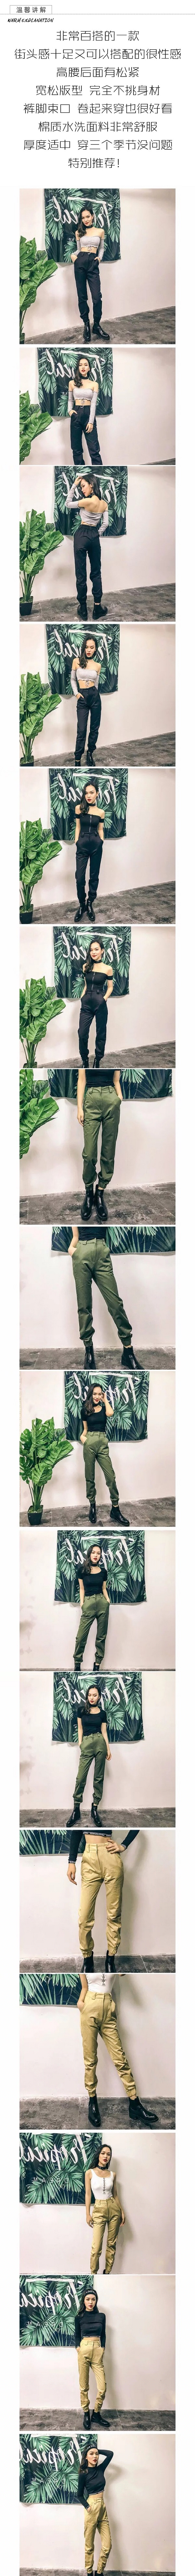 High waist pants camouflage loose joggers women army harem camo pants streetwear punk black cargo pants women capris trousers 11